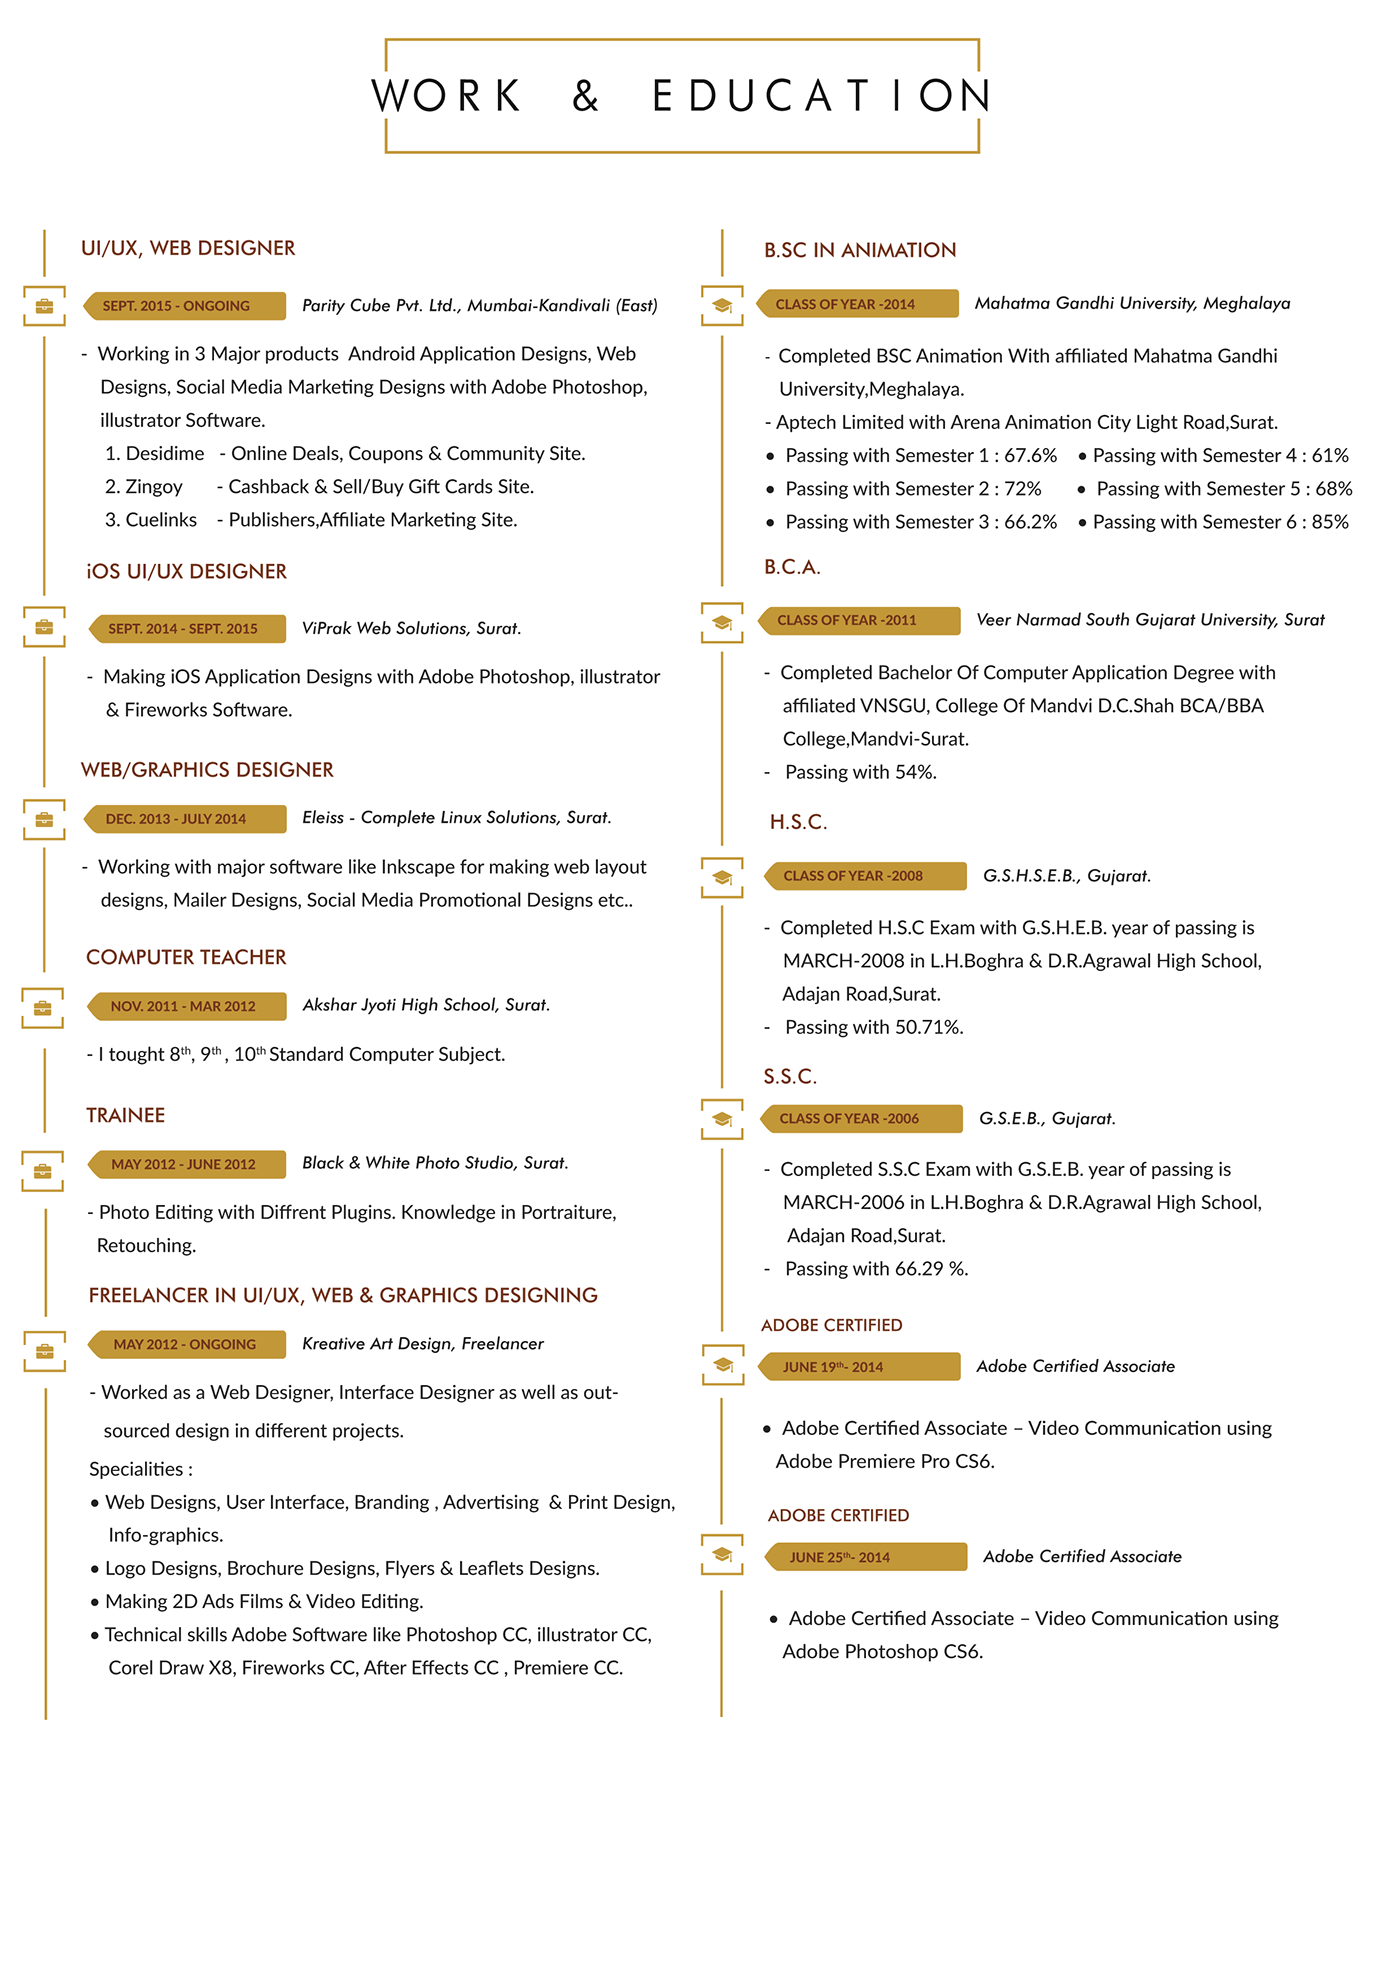 Resume - Keyur Pastagia on Behance